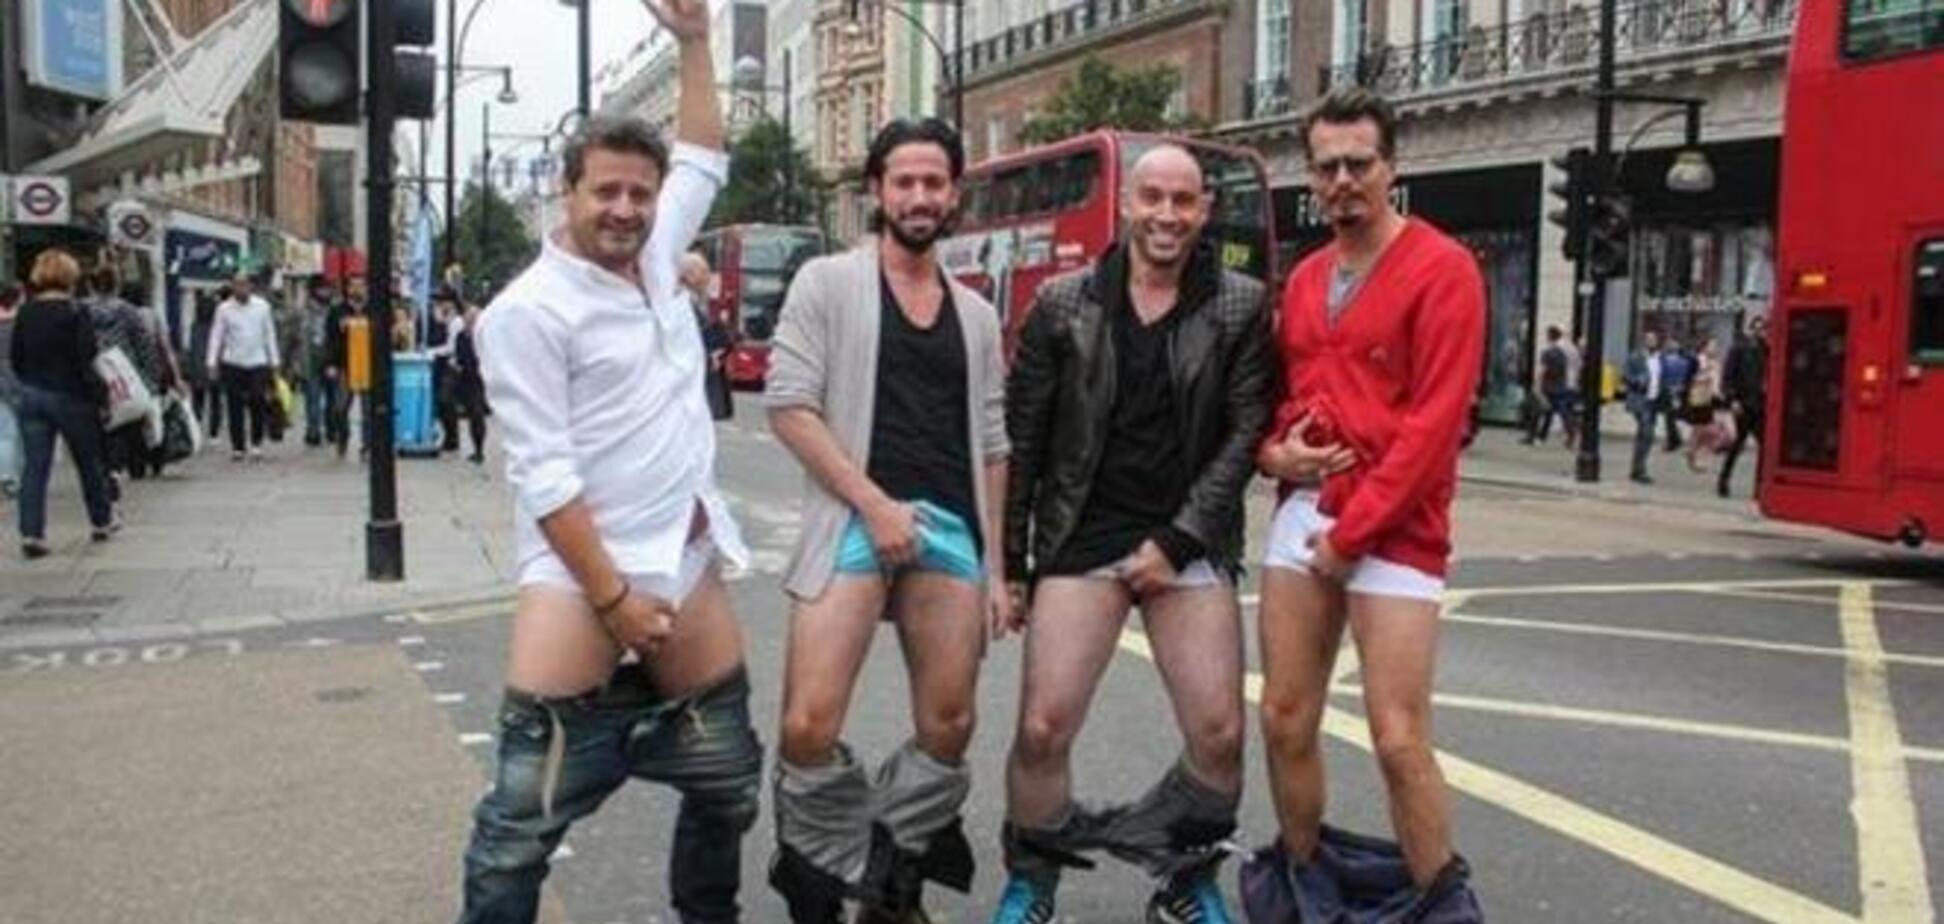 Новый флешмоб без обливаний и капиталовложений #FeelingNuts захватил мужчин всего мира